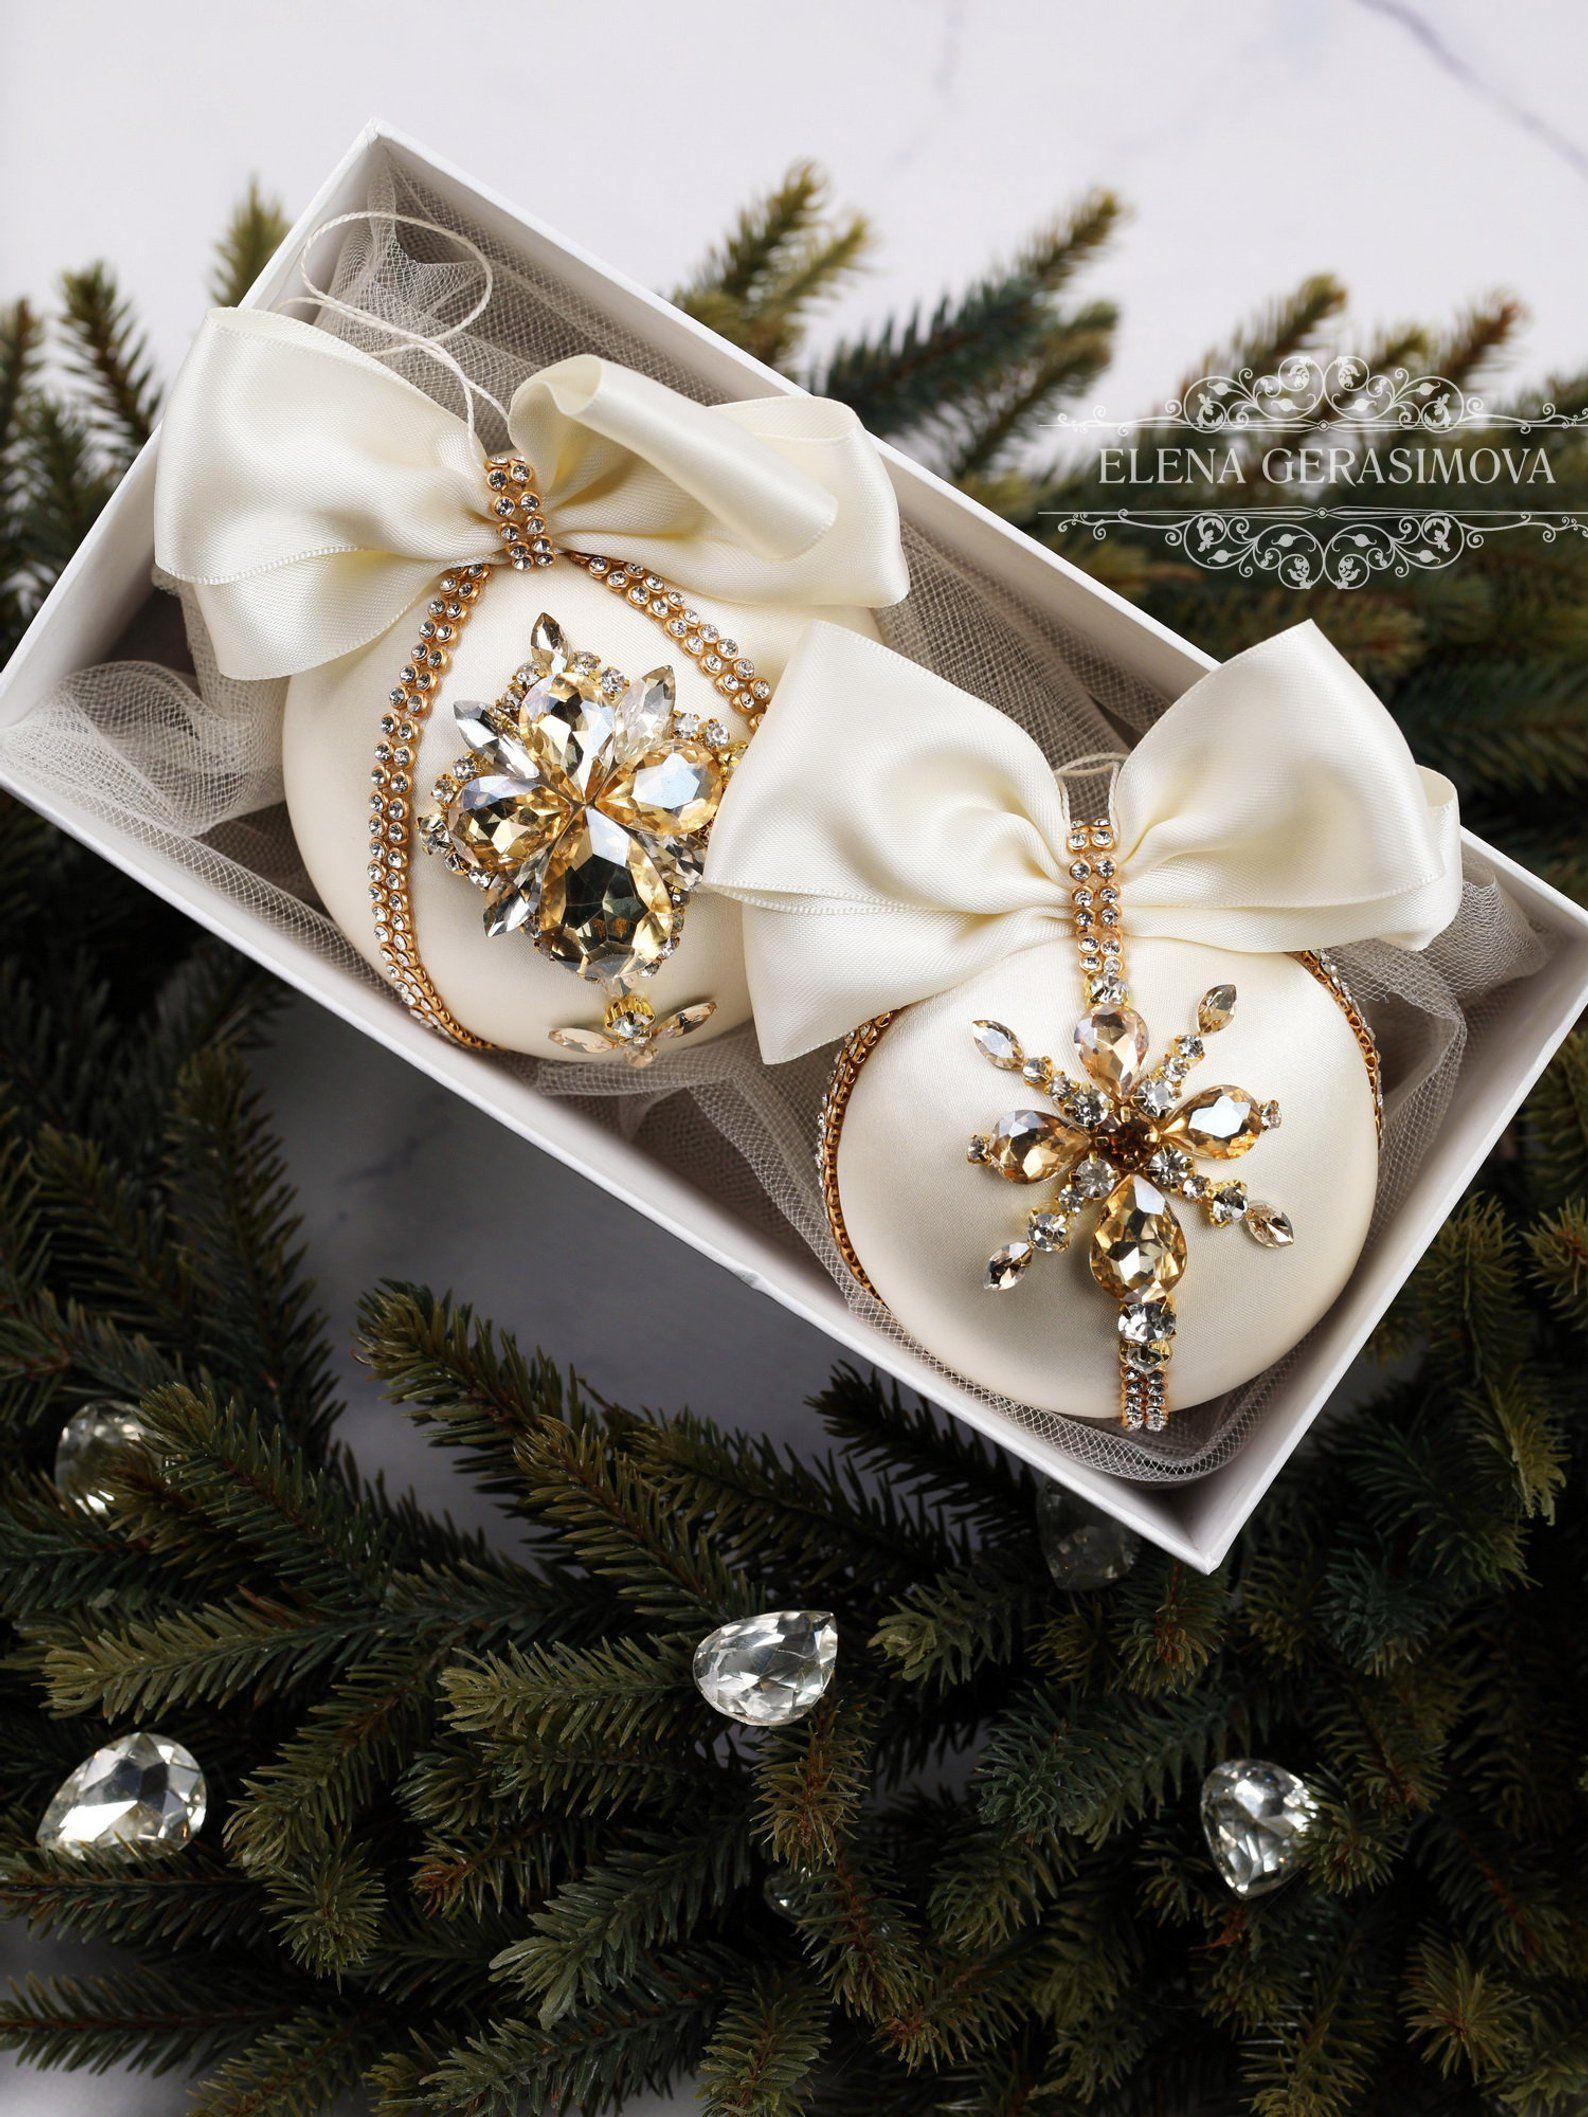 Christmas Rhinestones Ornaments Handmade Balls In Gift Box Xmas Decorations Tree Decor Set Ivory Gold Baubles Rhinestone Ornaments Xmas Decorations Handmade Ornaments